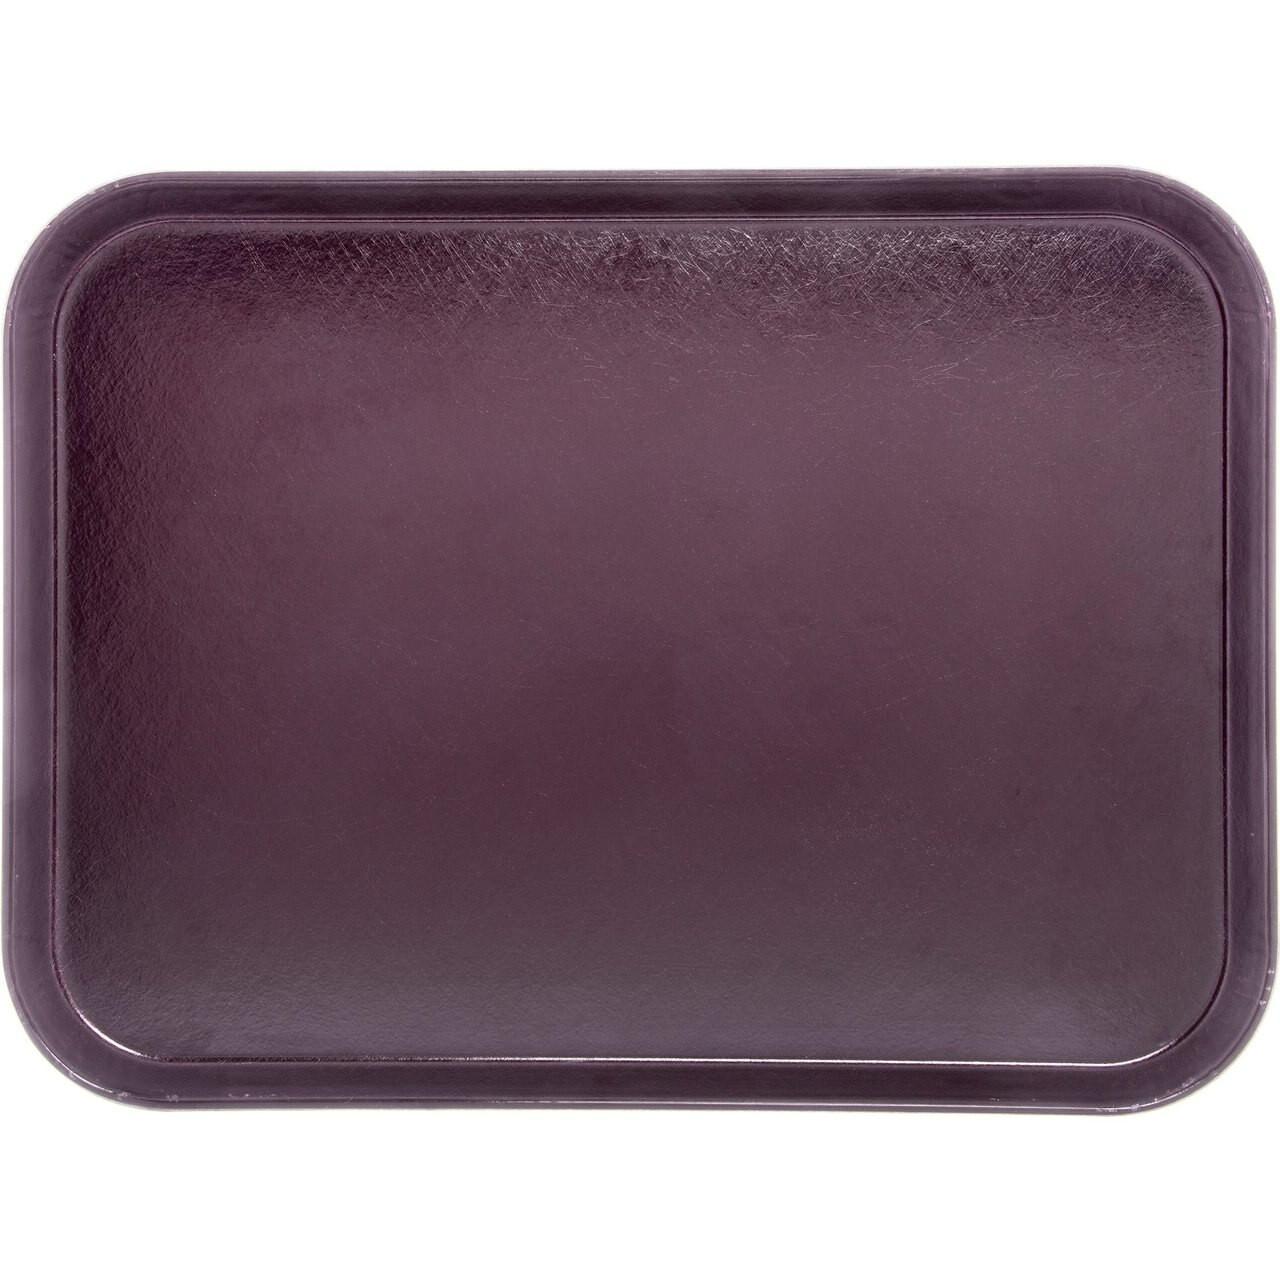 "Tray, 15"" x 20"", size M, flat, fiberglass, cranberry (12 each per case)"